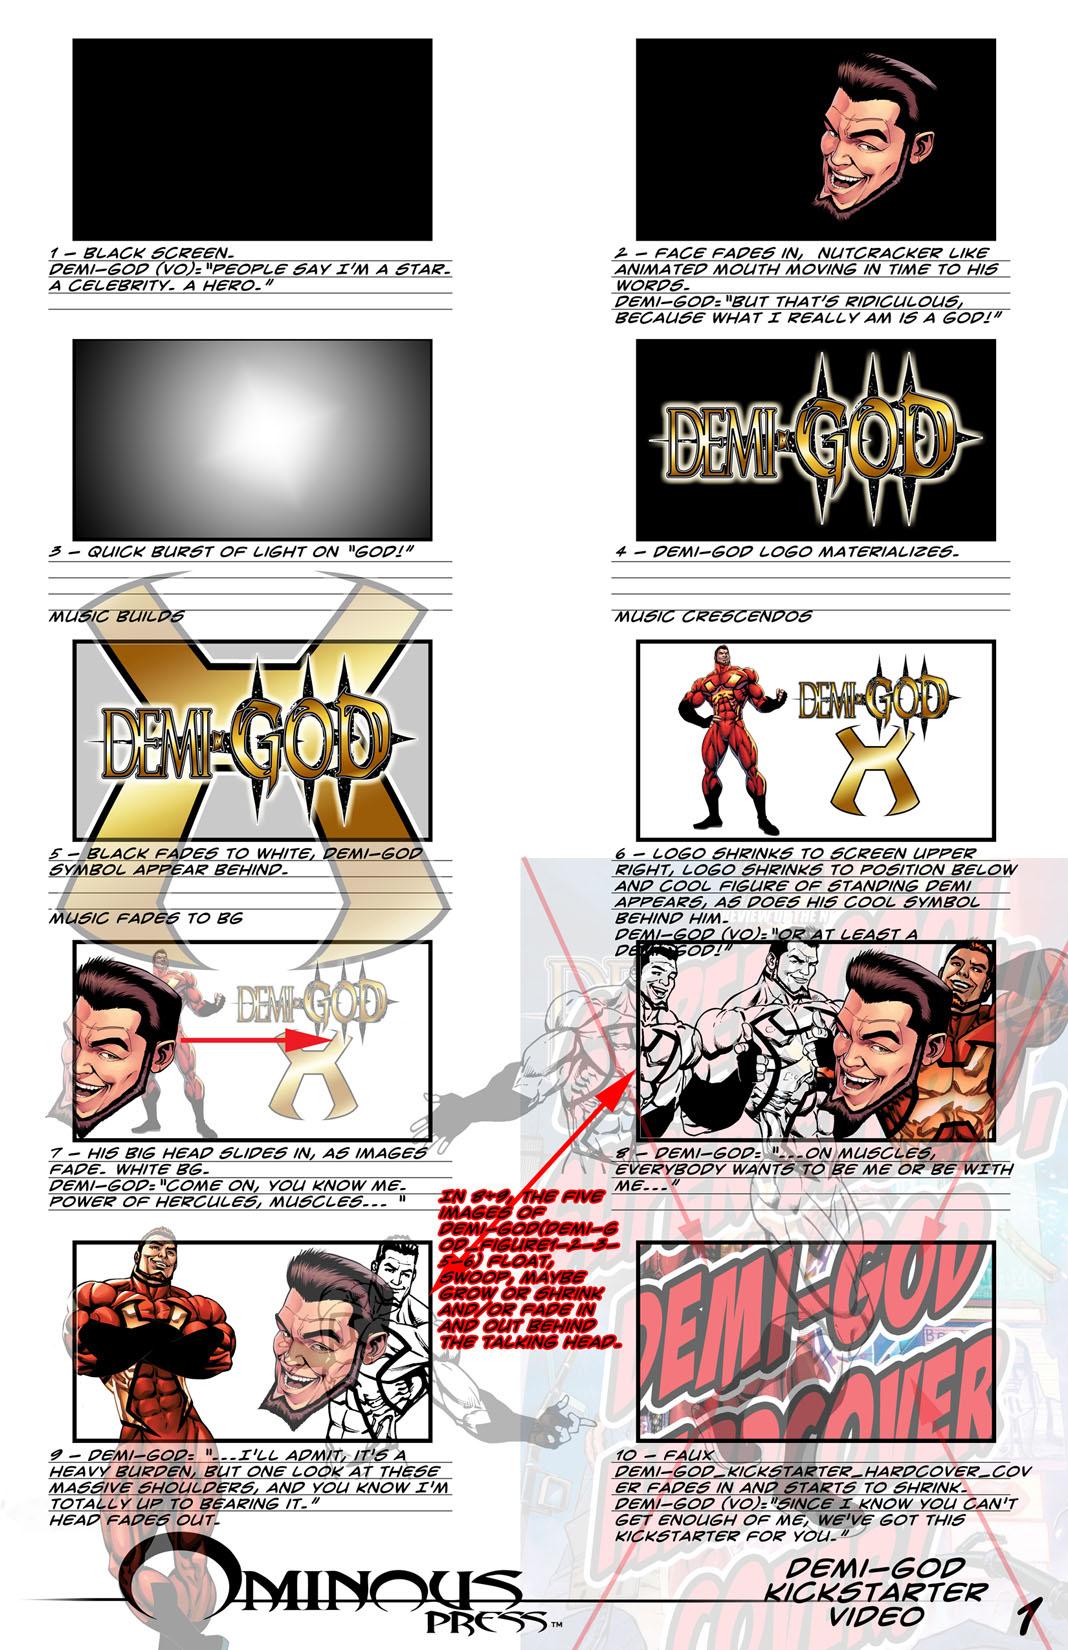 Demi-God_KickstarterVideo_Storyboard_Pag